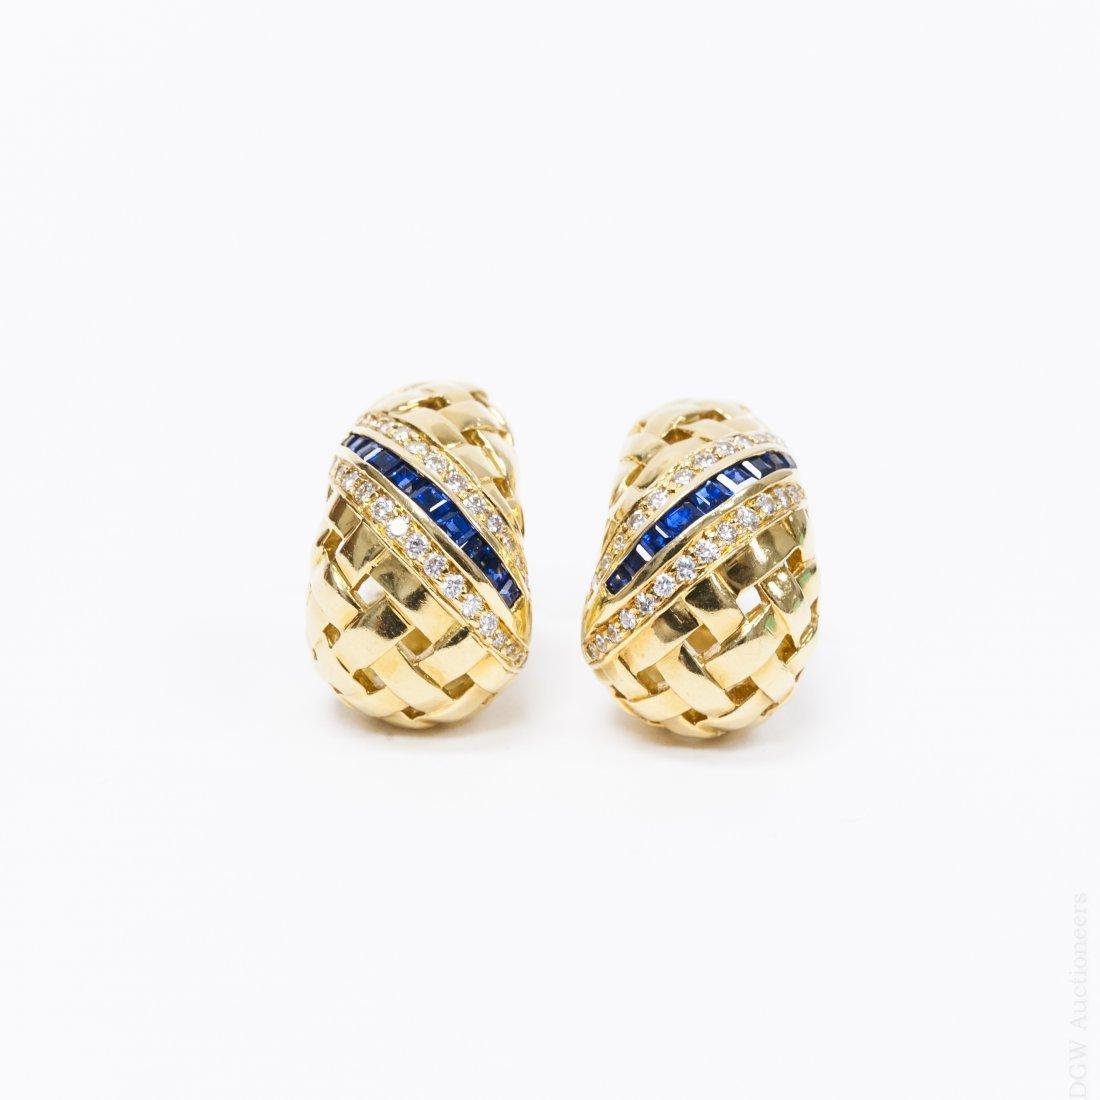 Tiffany & Co. 18K Gold, Diamonds and Sapphire Earrings.